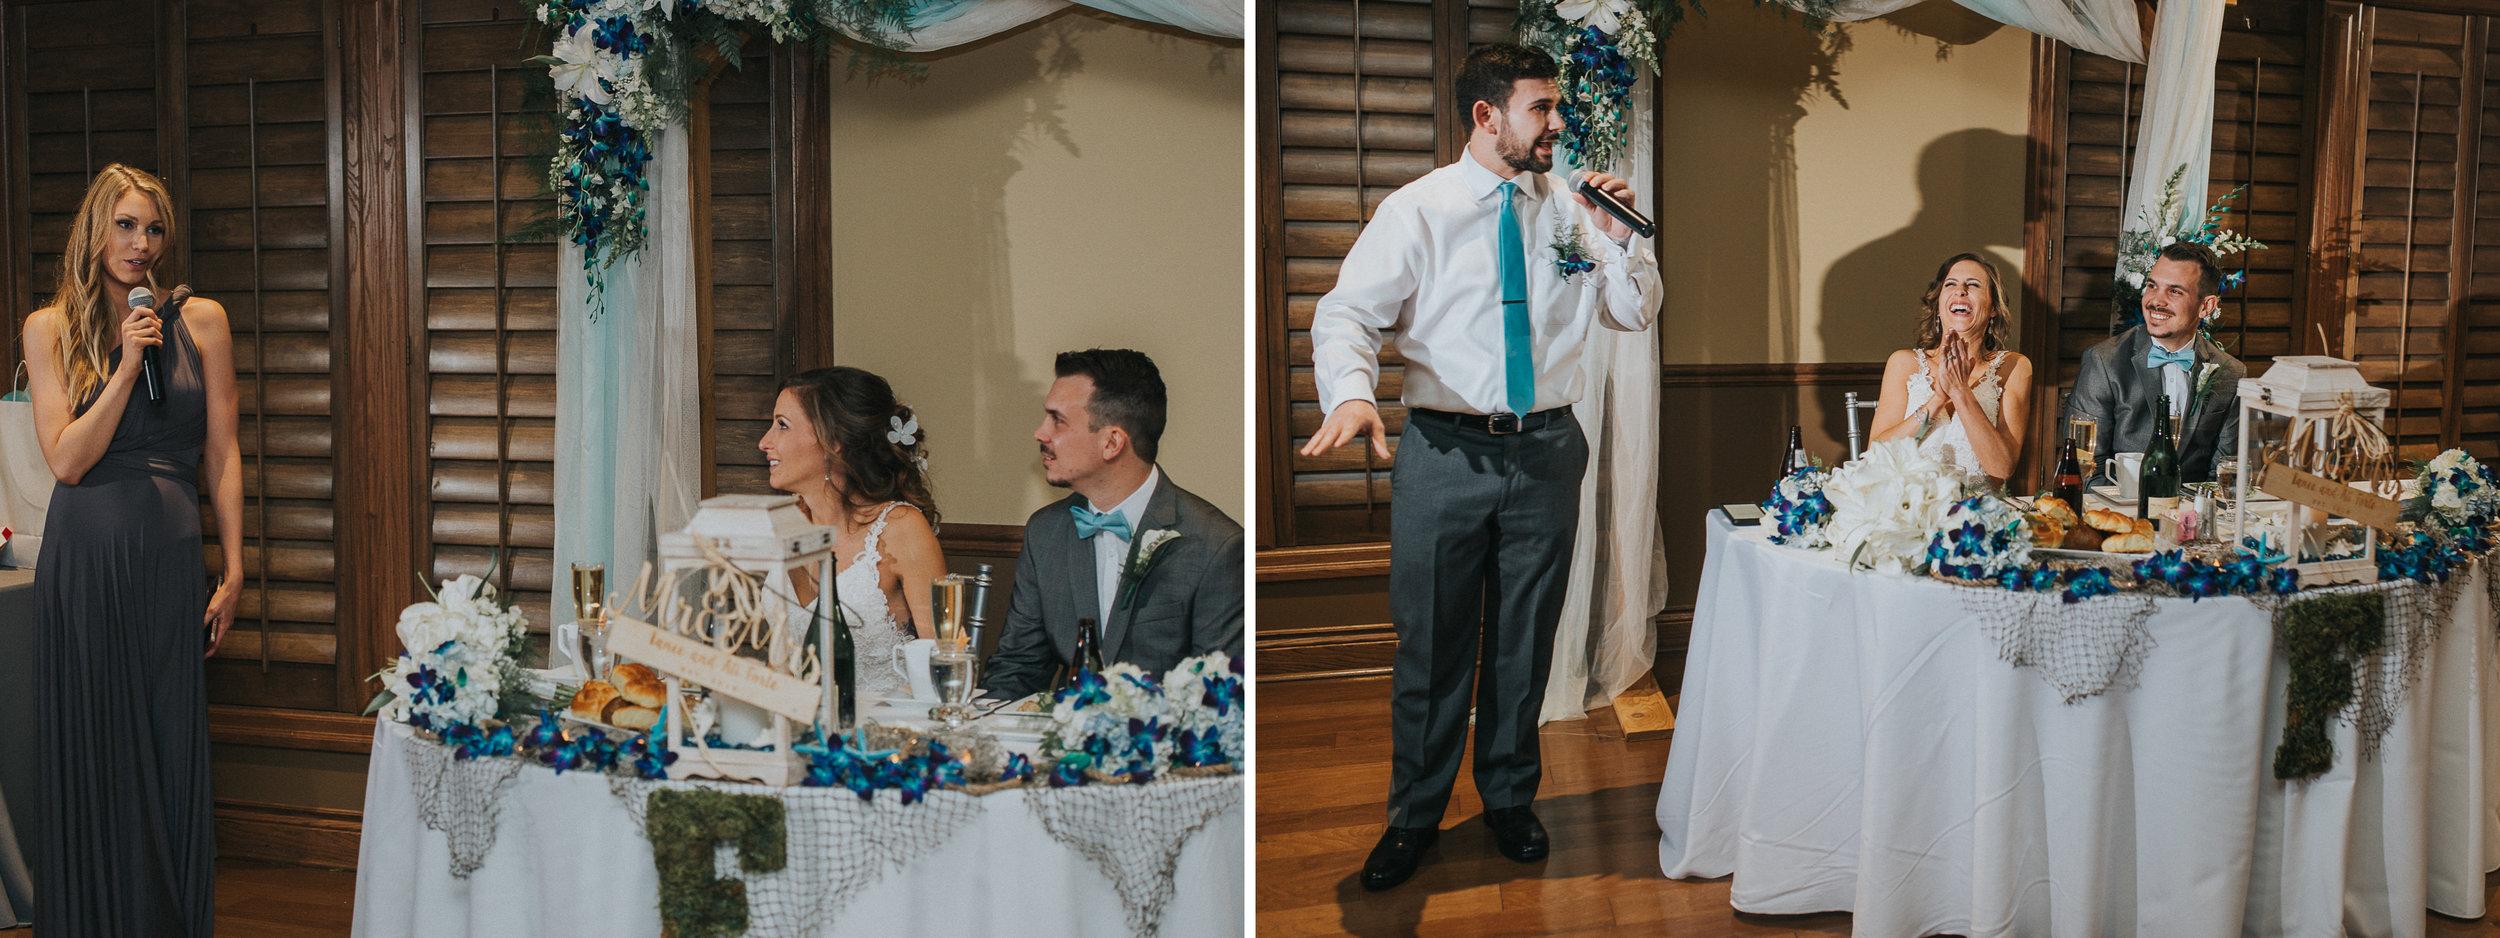 Camden-Boast-House-Wedding-Ali-and-Lance Forte-15.jpg